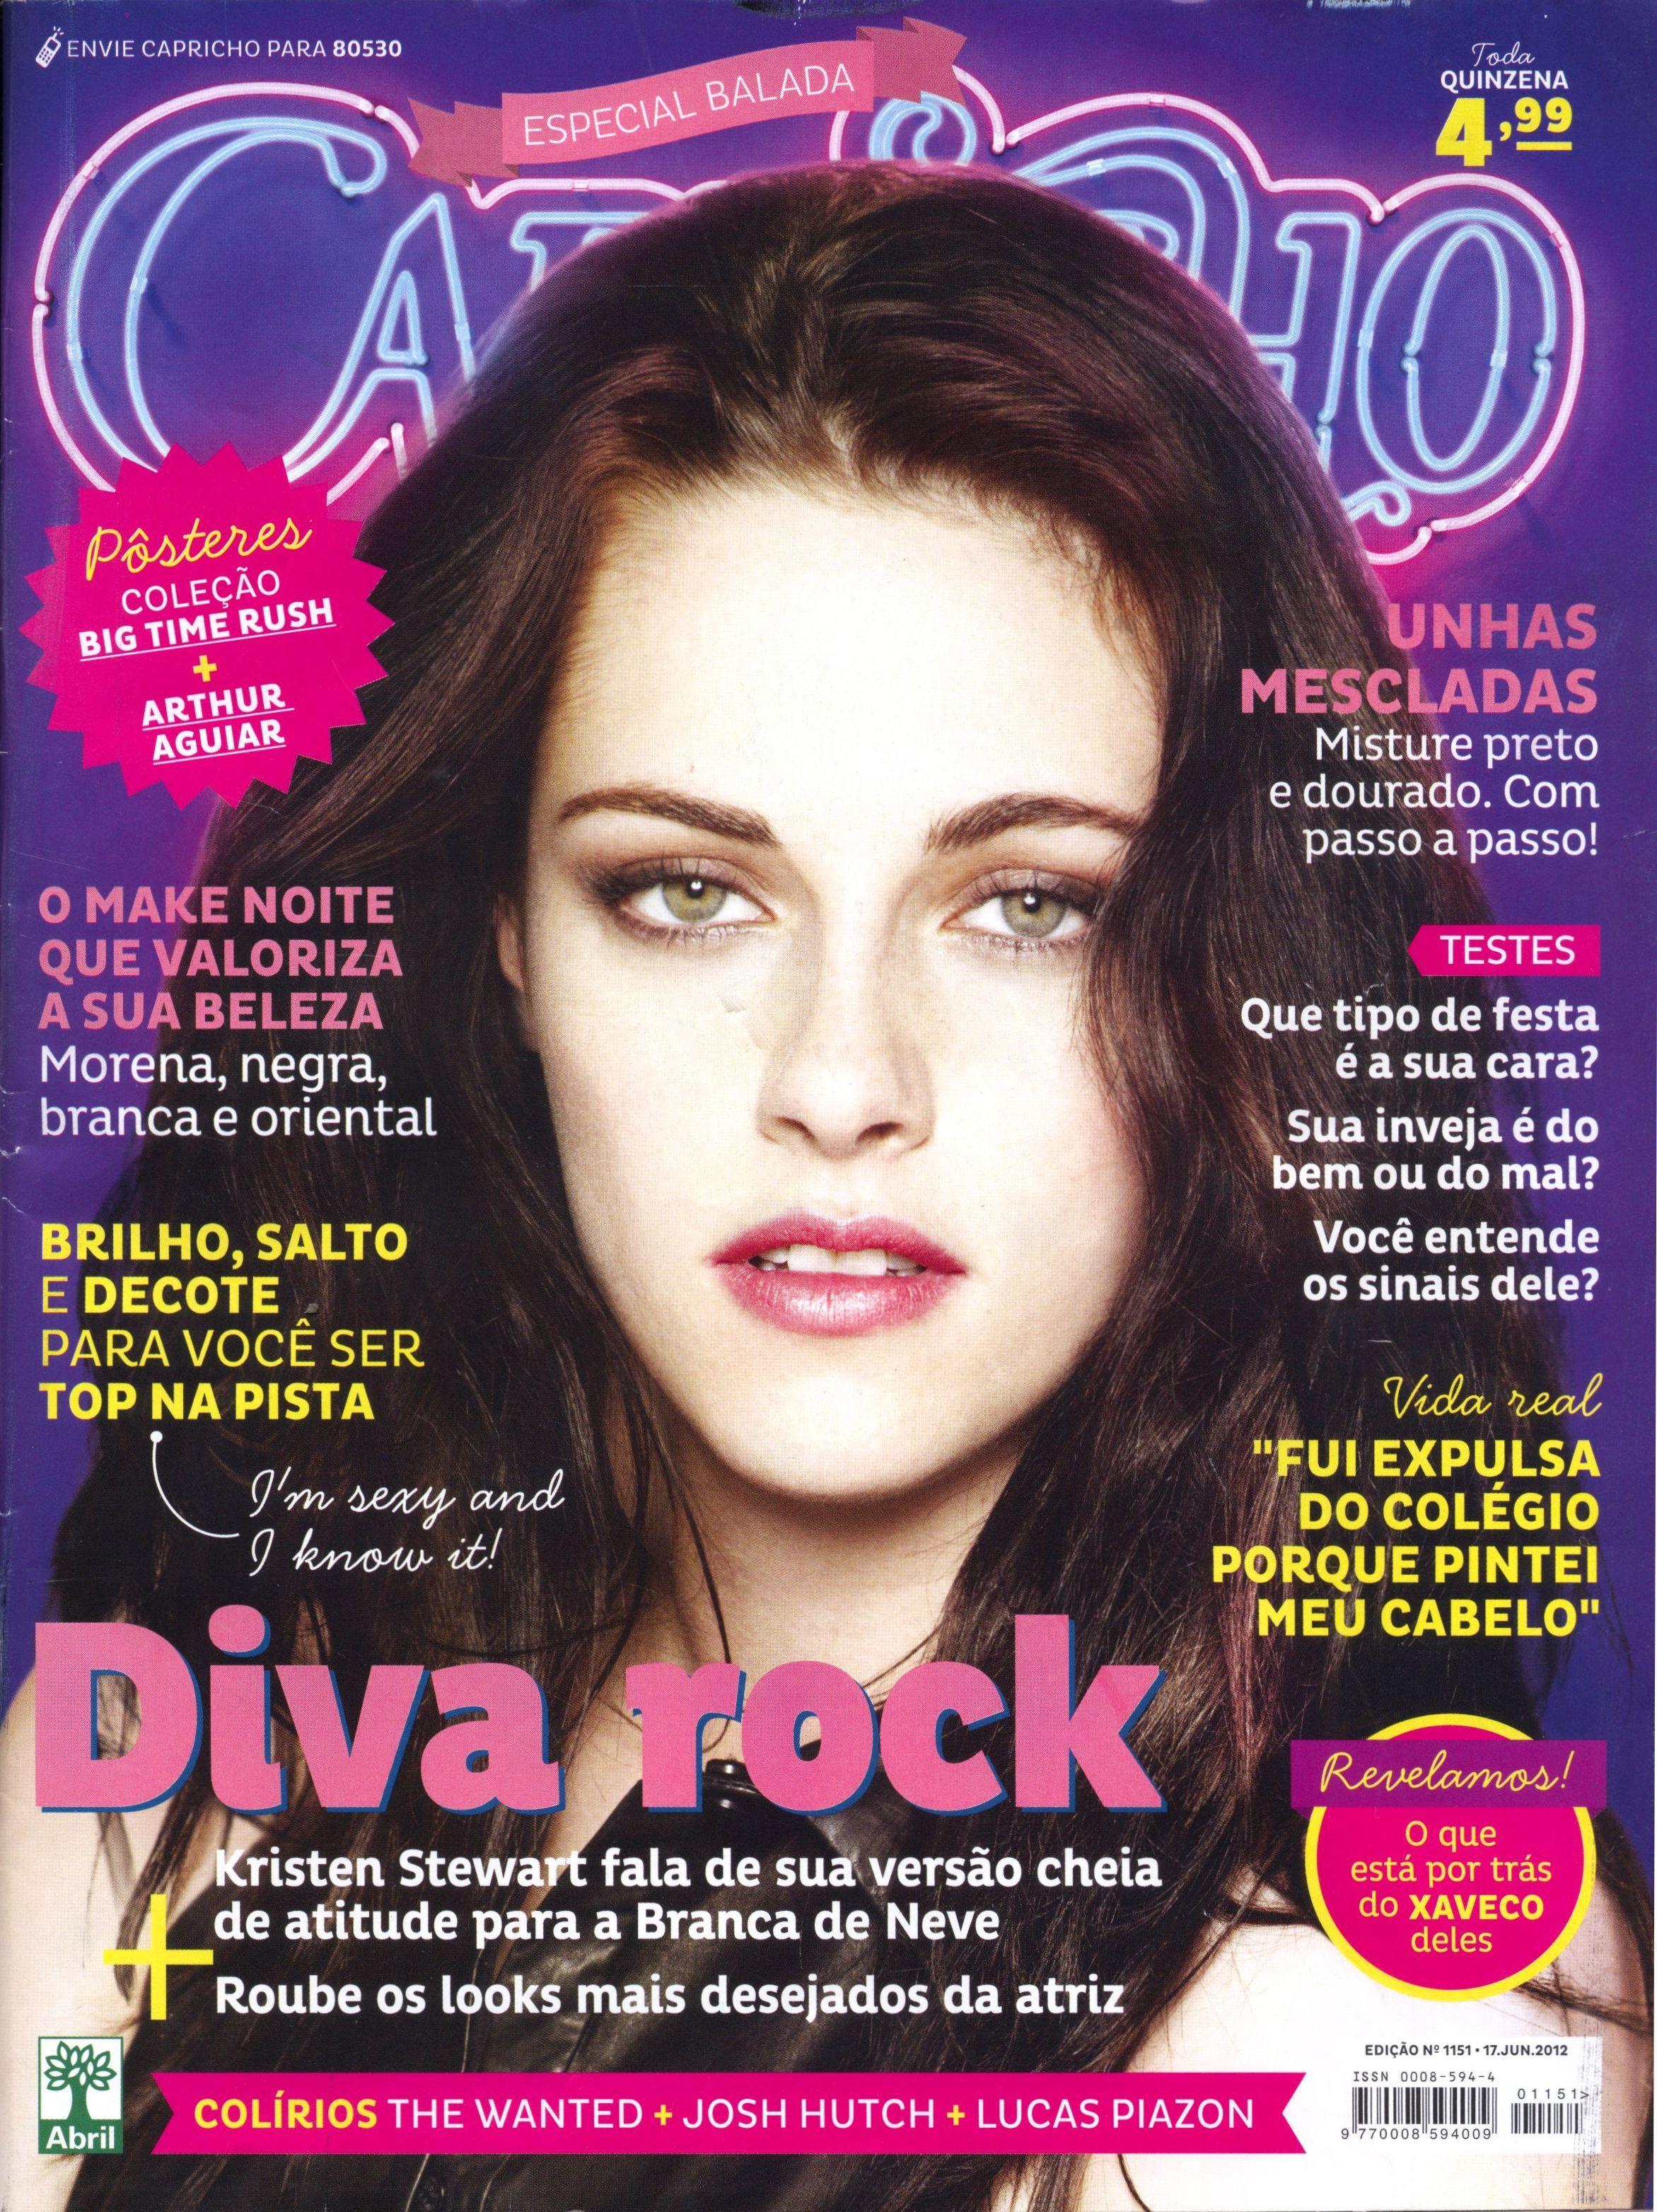 Extremamente revista capricho moda 9 | capas | Pinterest | Kristen stewart  FS56